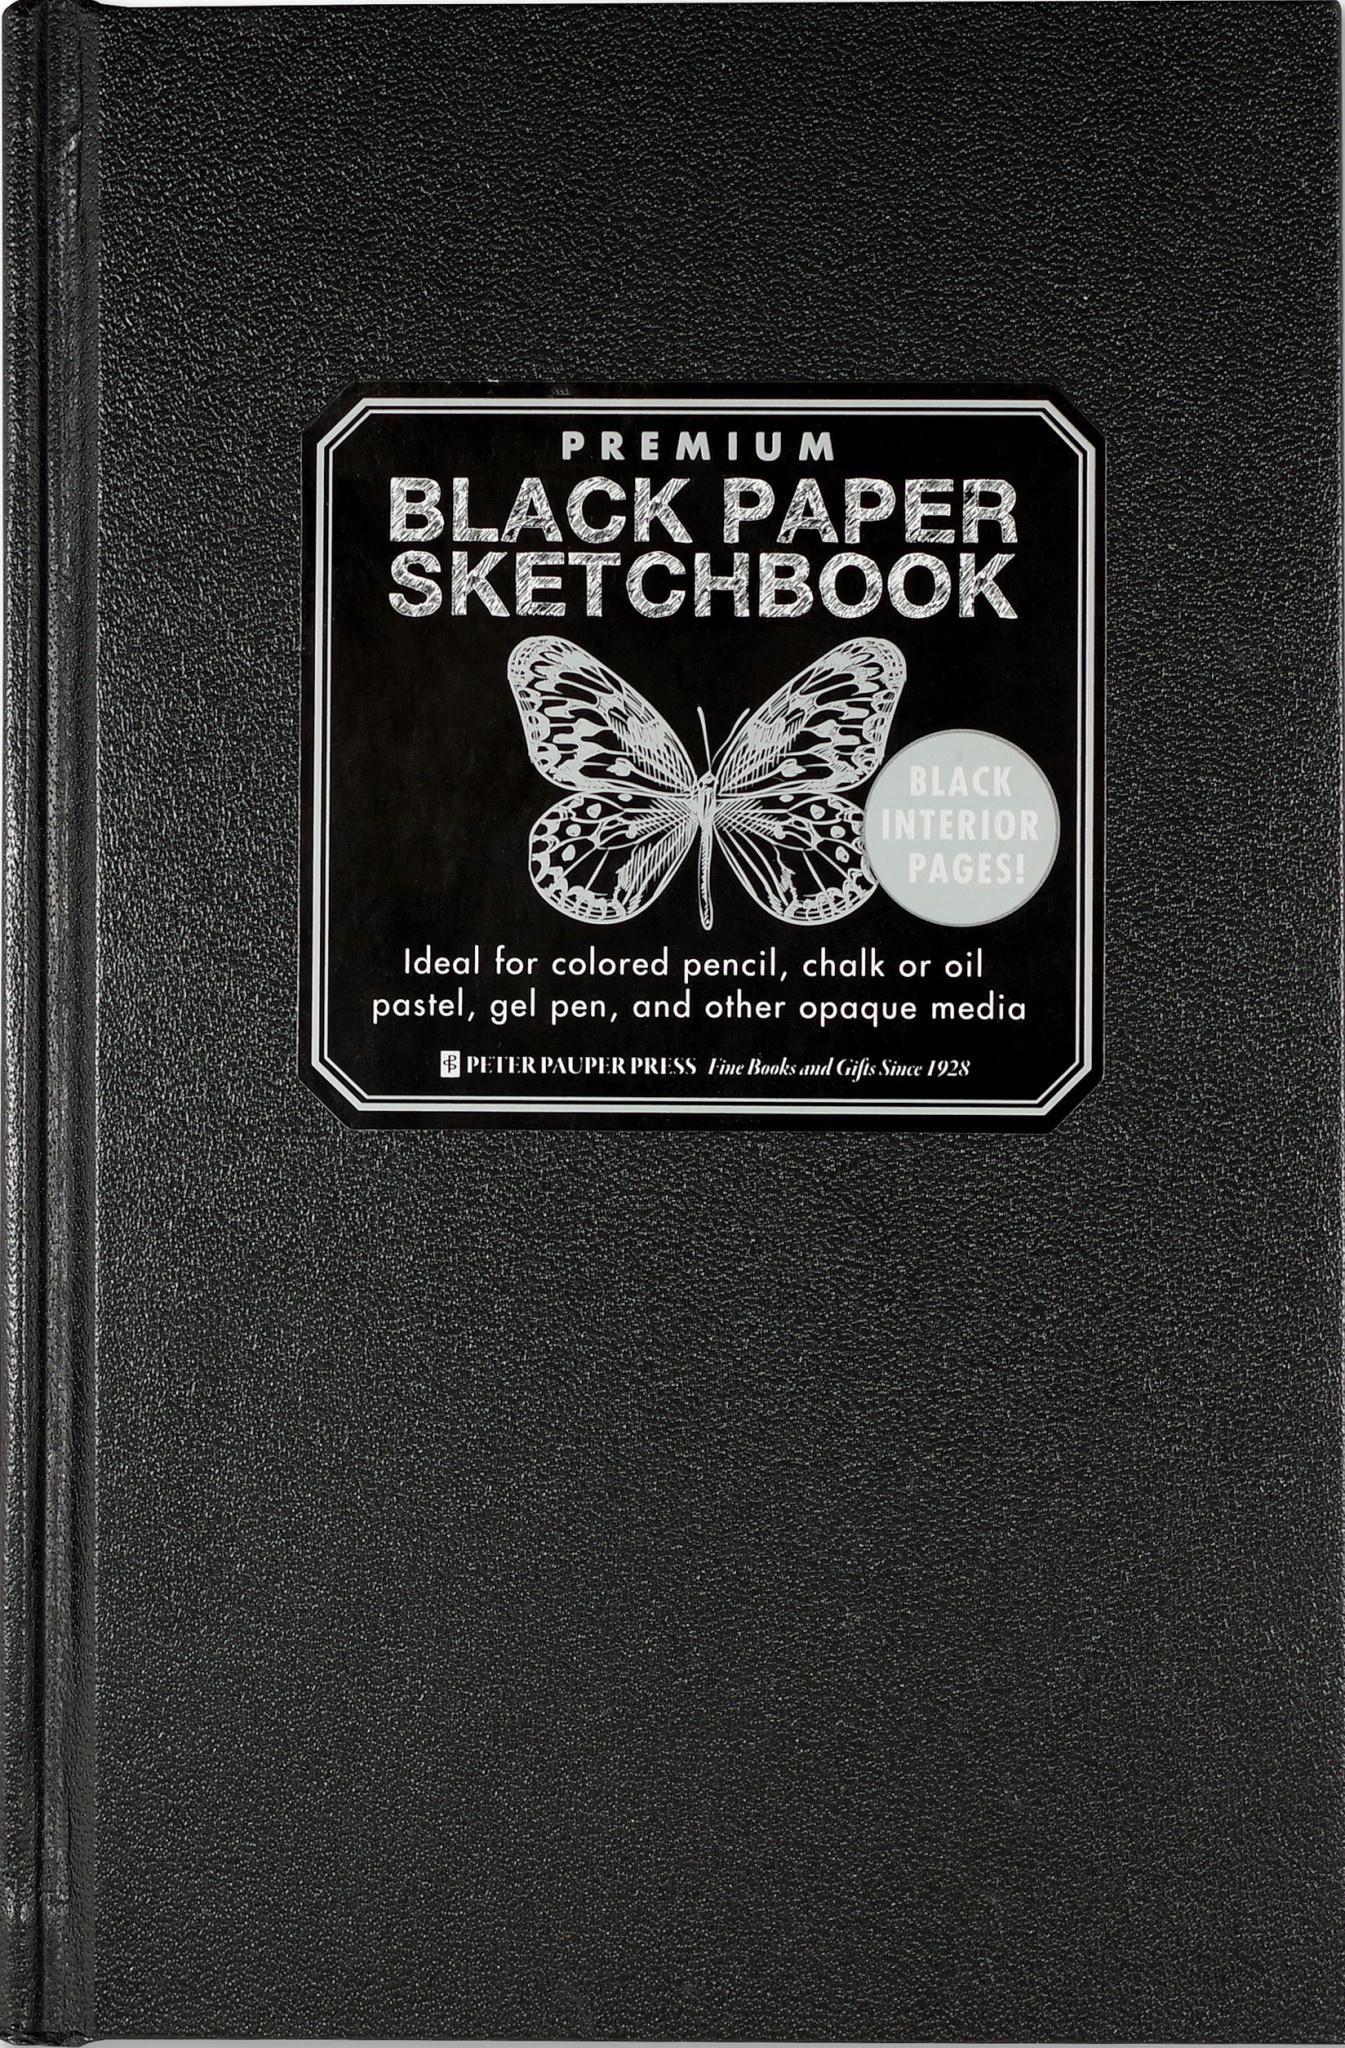 Premium Black Paper Sketchbook